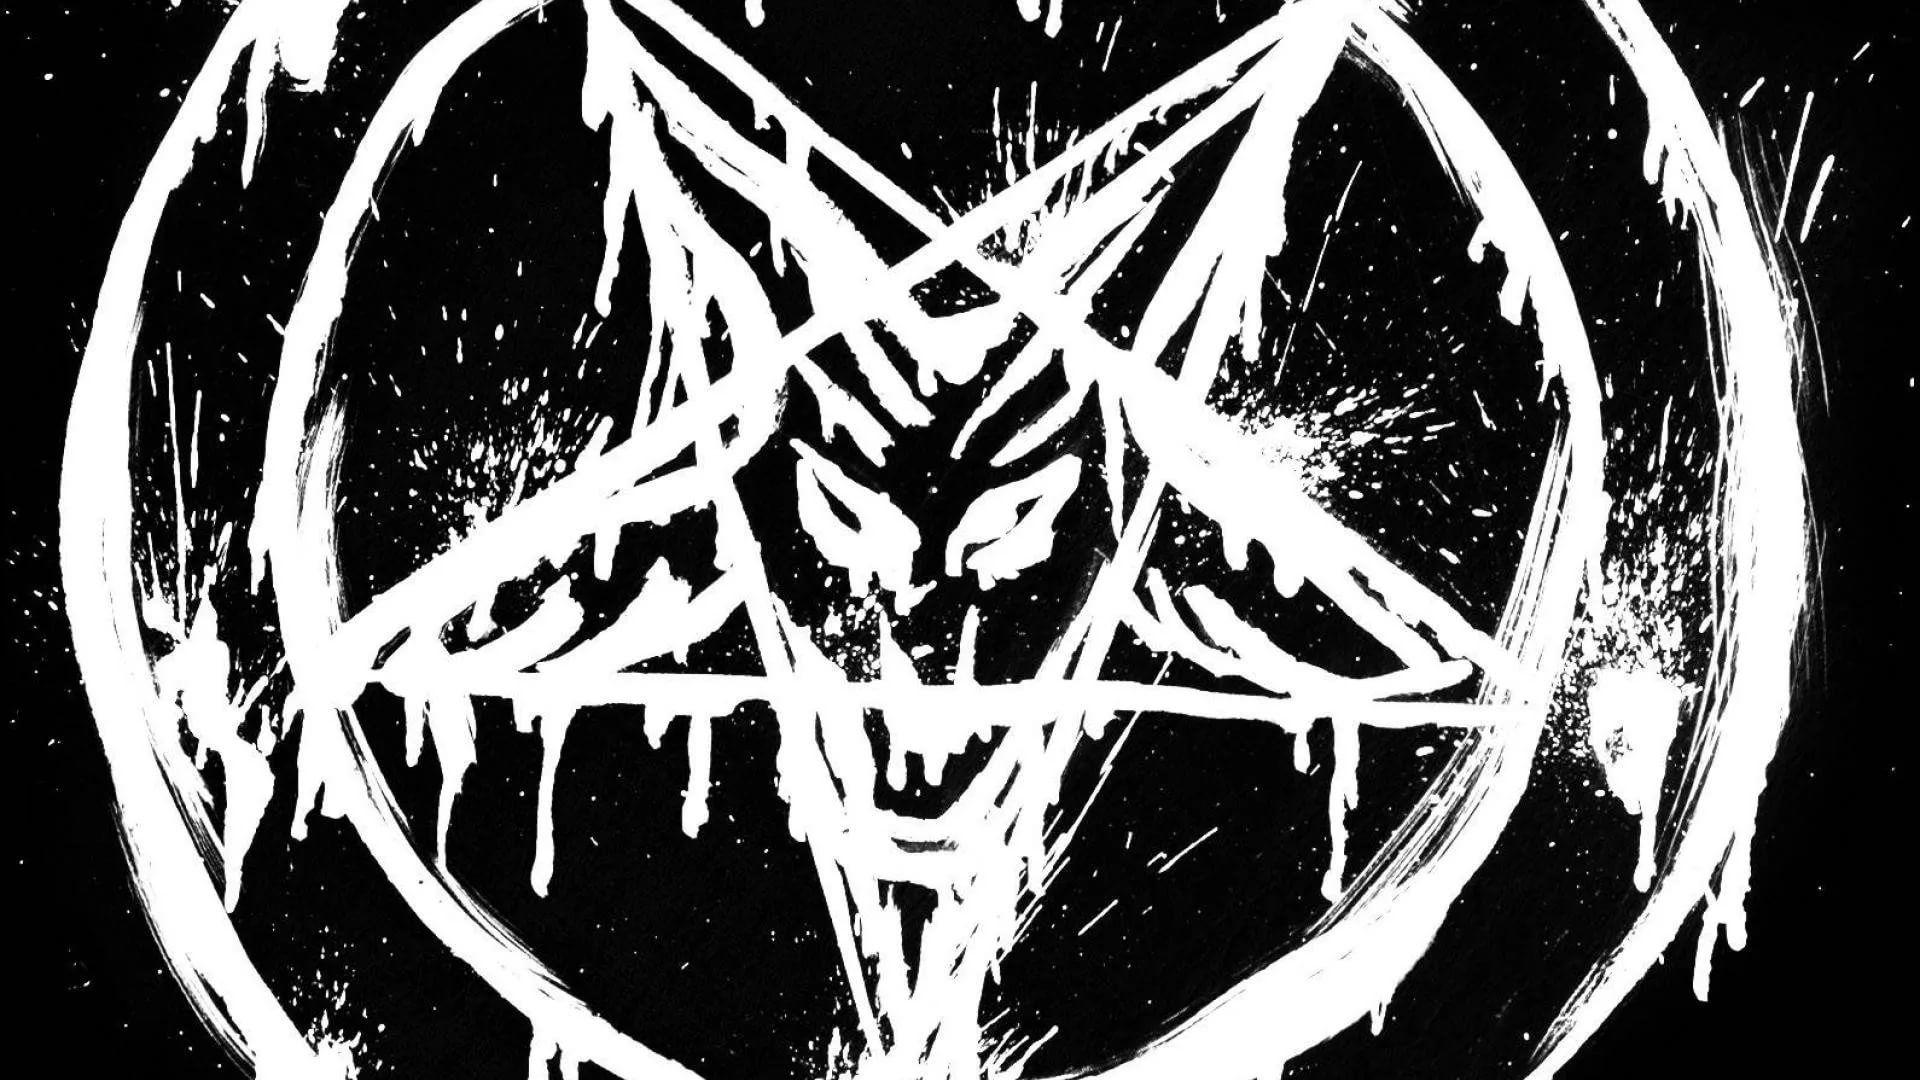 Satanic download wallpaper image